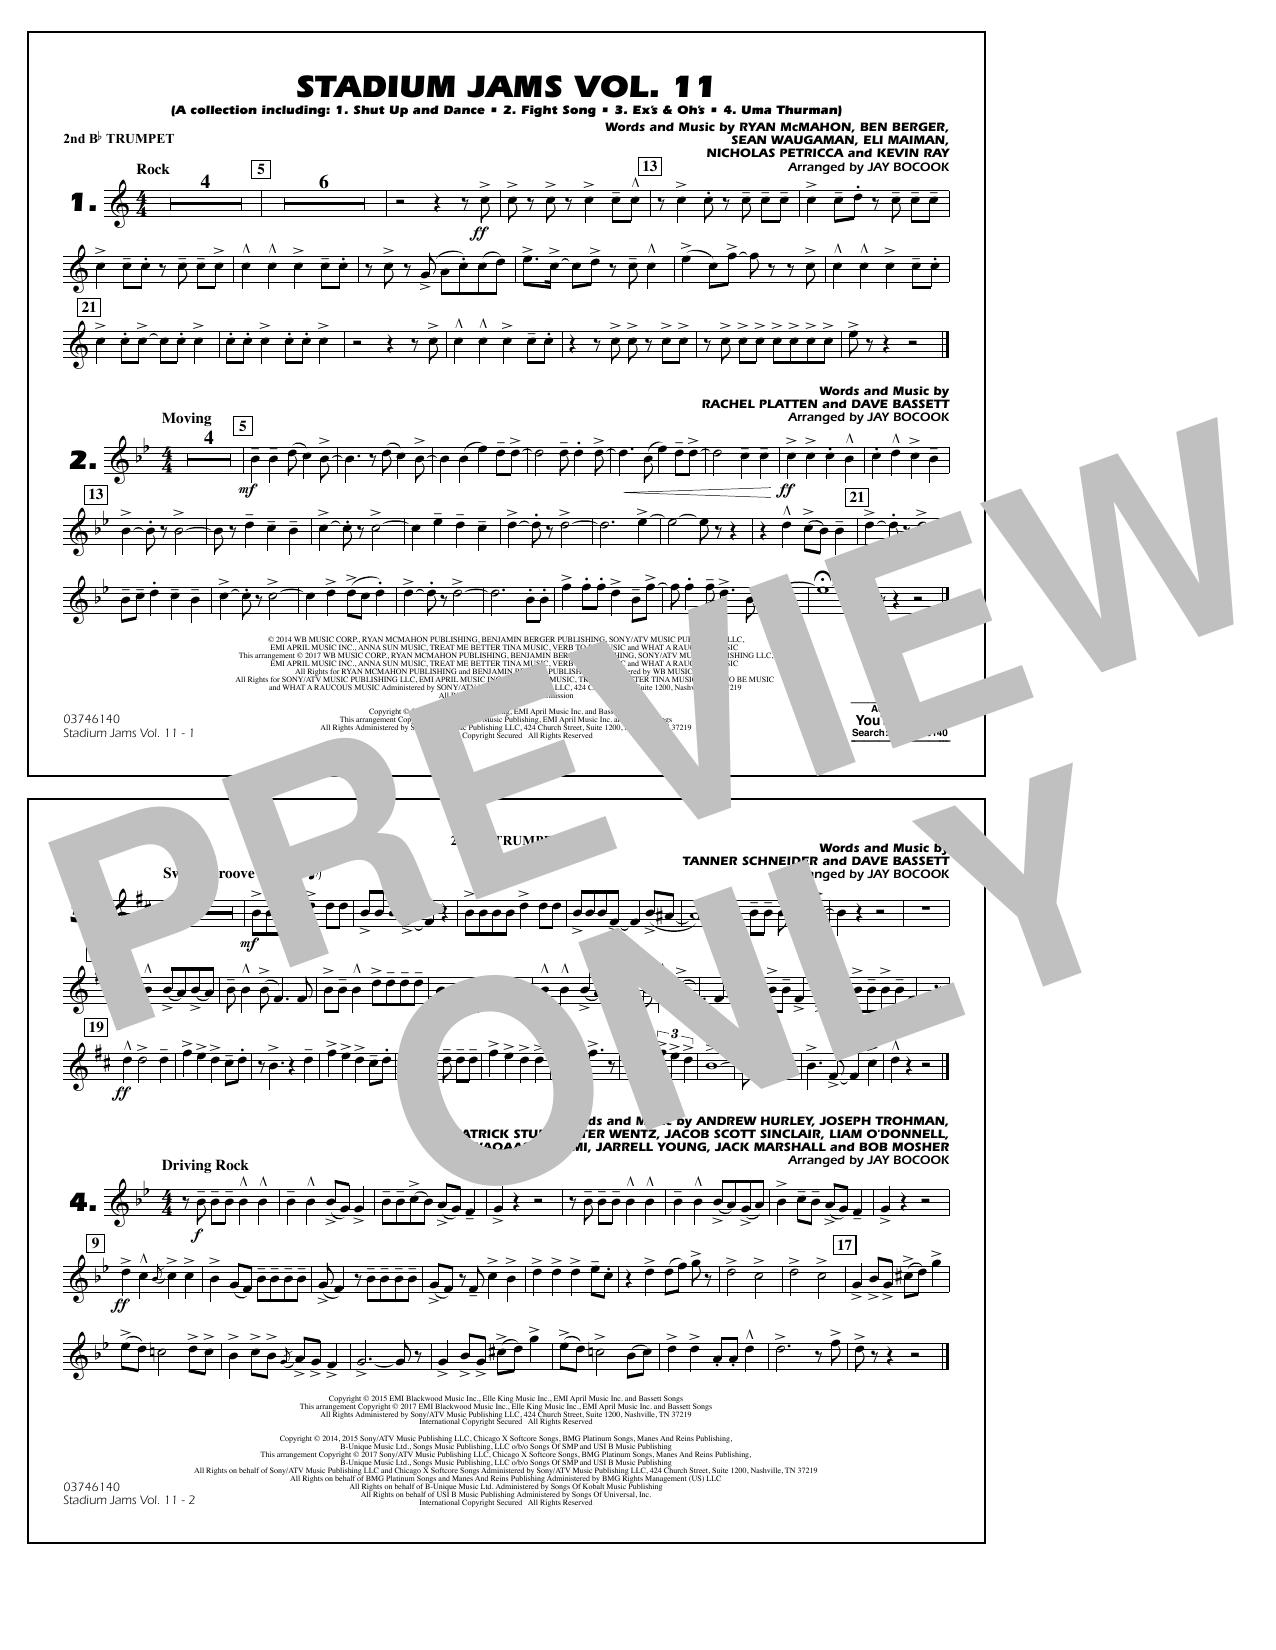 Stadium Jams Volume 11 - 2nd Bb Trumpet Sheet Music